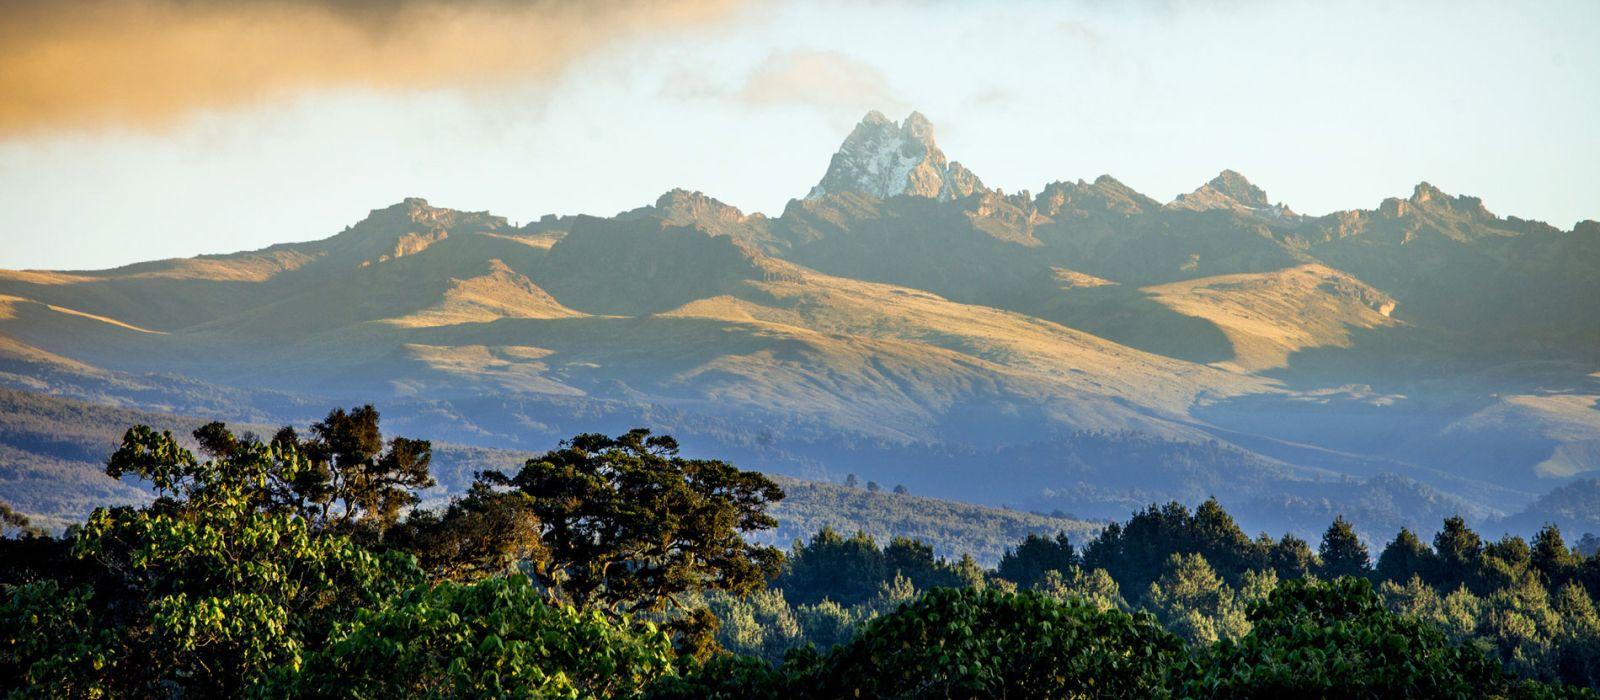 Mount Kenia Karte.Reiseziel Mount Kenya In Kenia Enchanting Travels